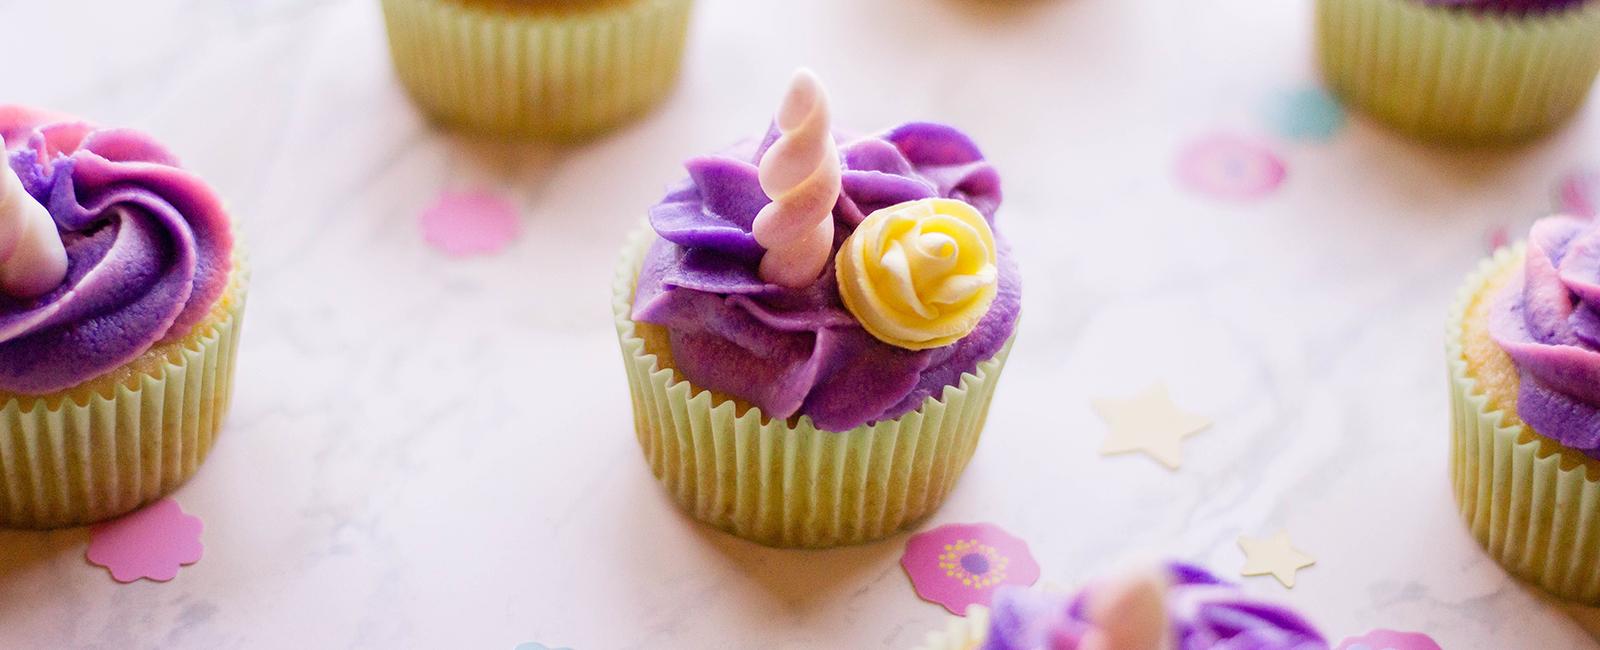 Unicorn-Themed Parties 101: The Unicorn Cupcake